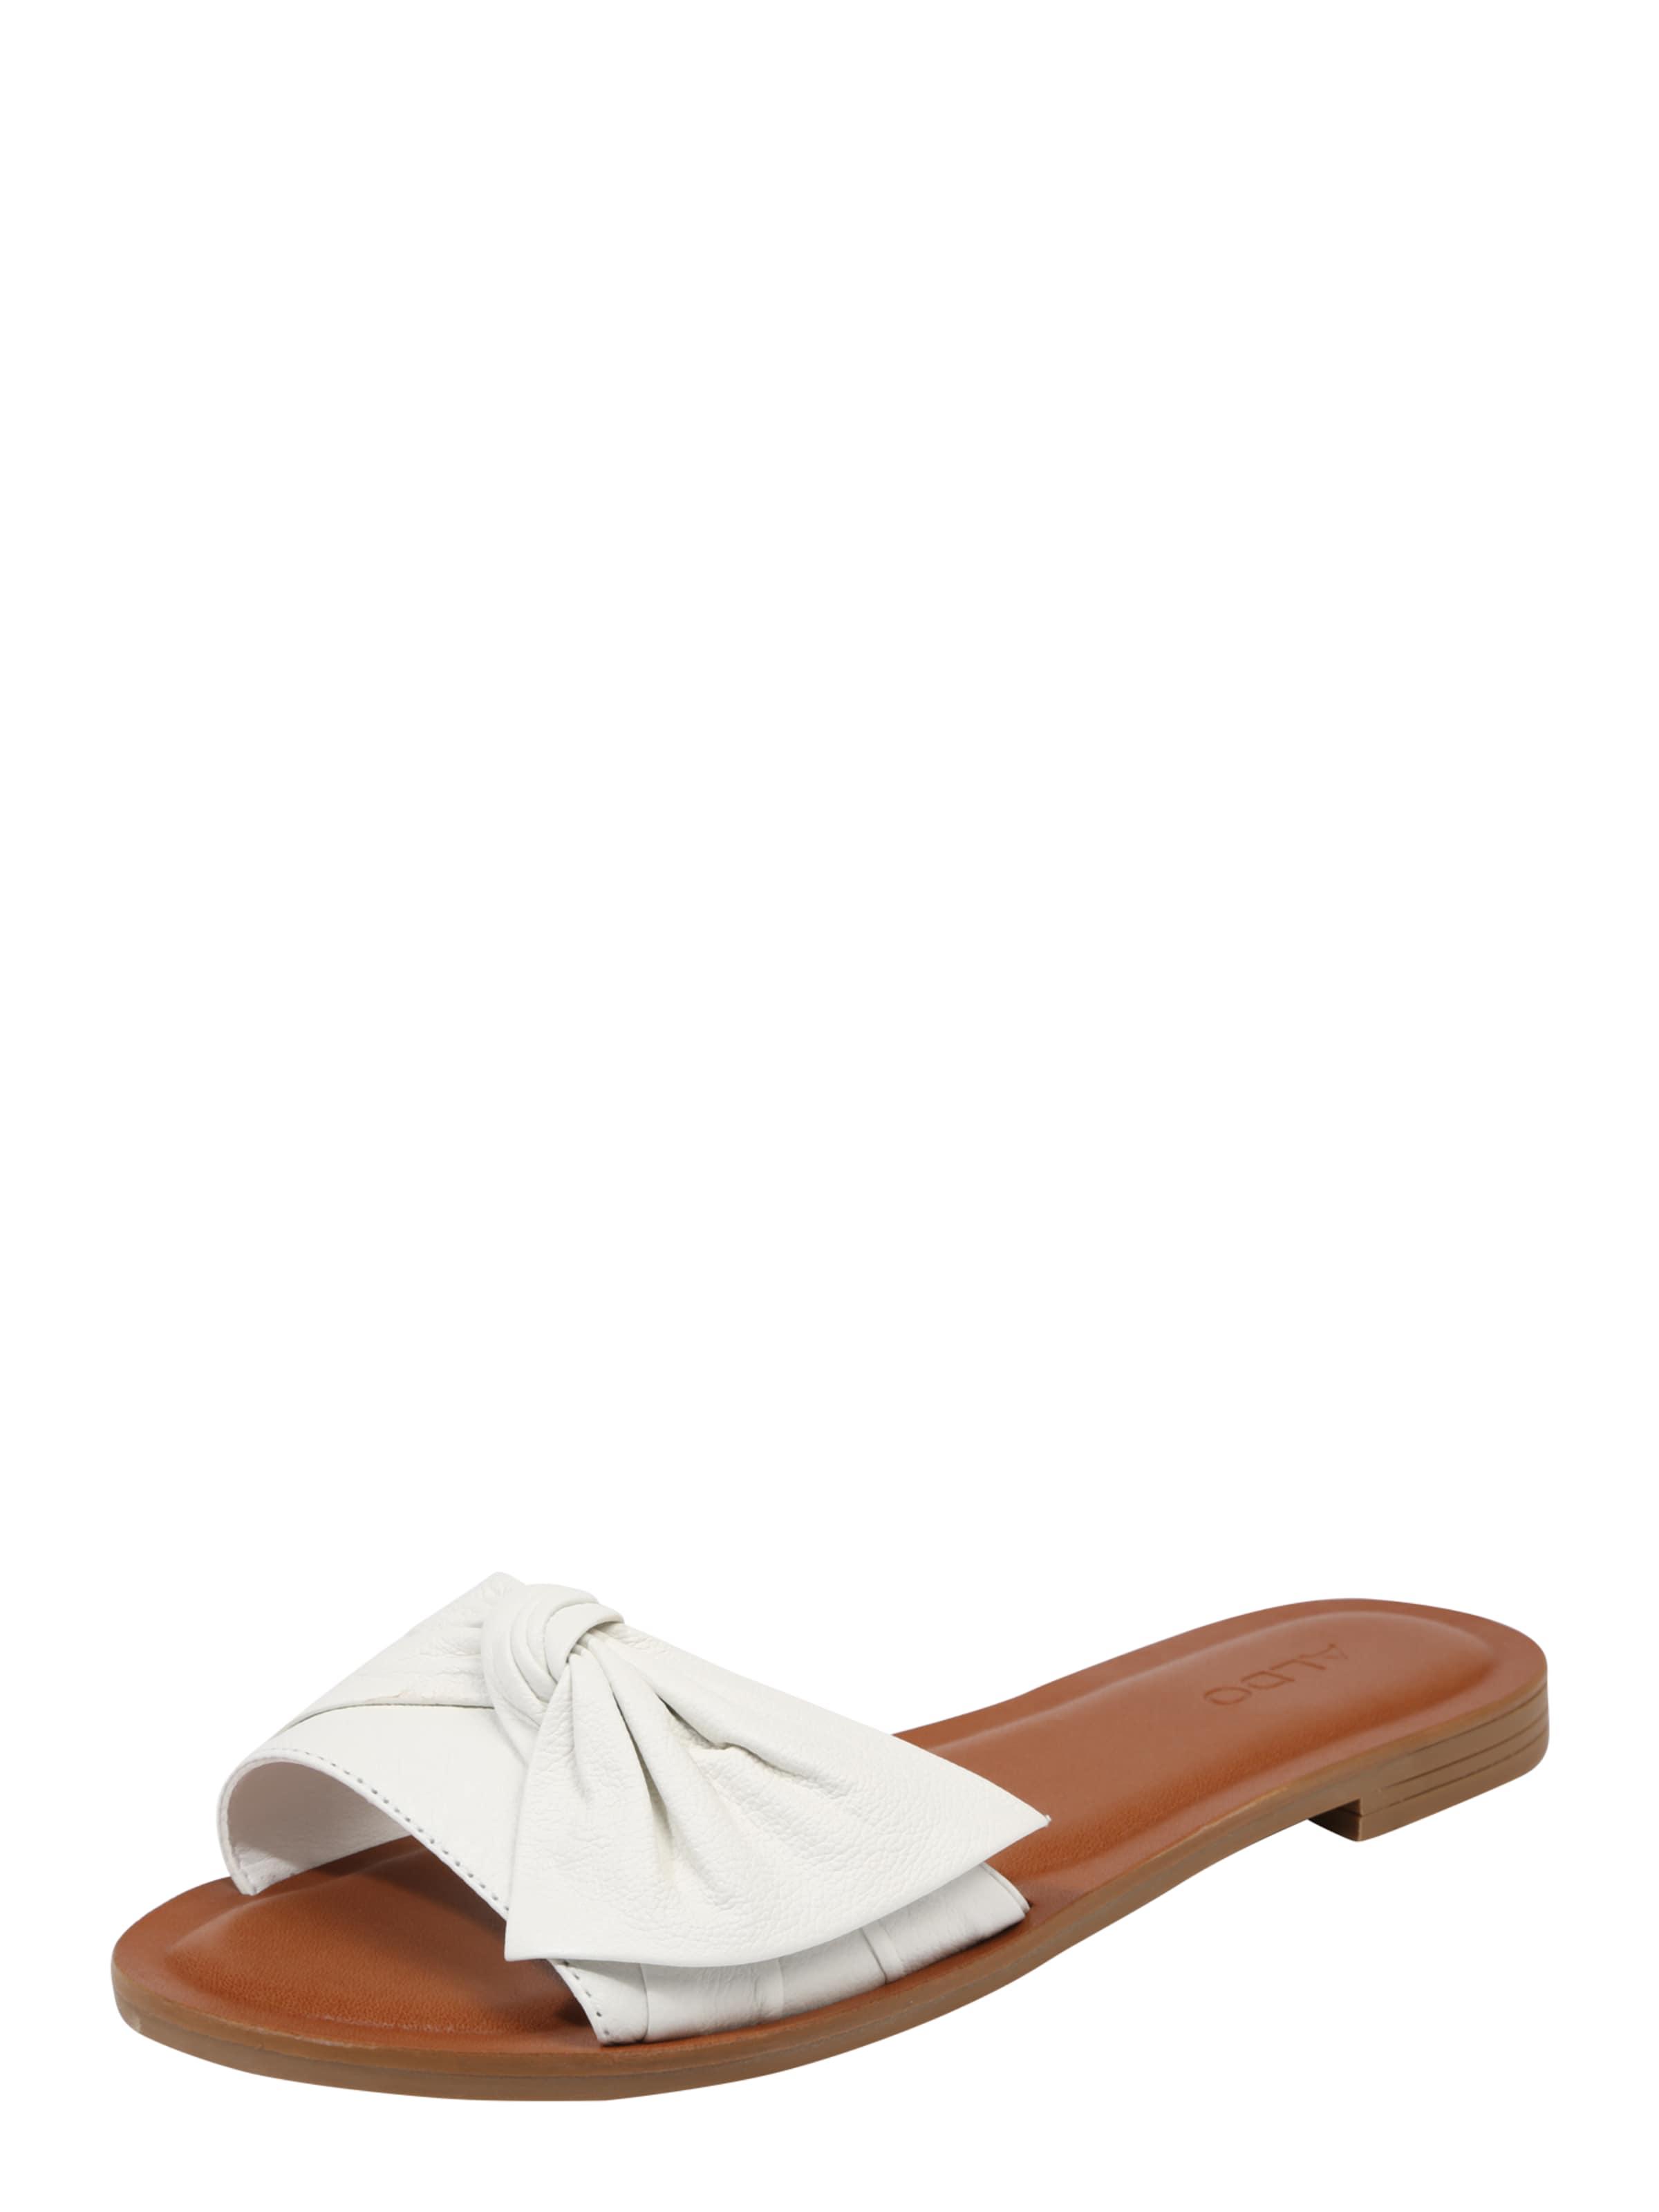 Haltbare Mode billige Schuhe ALDO | Sandalen 'ENROELIA' Schuhe Gut getragene Schuhe